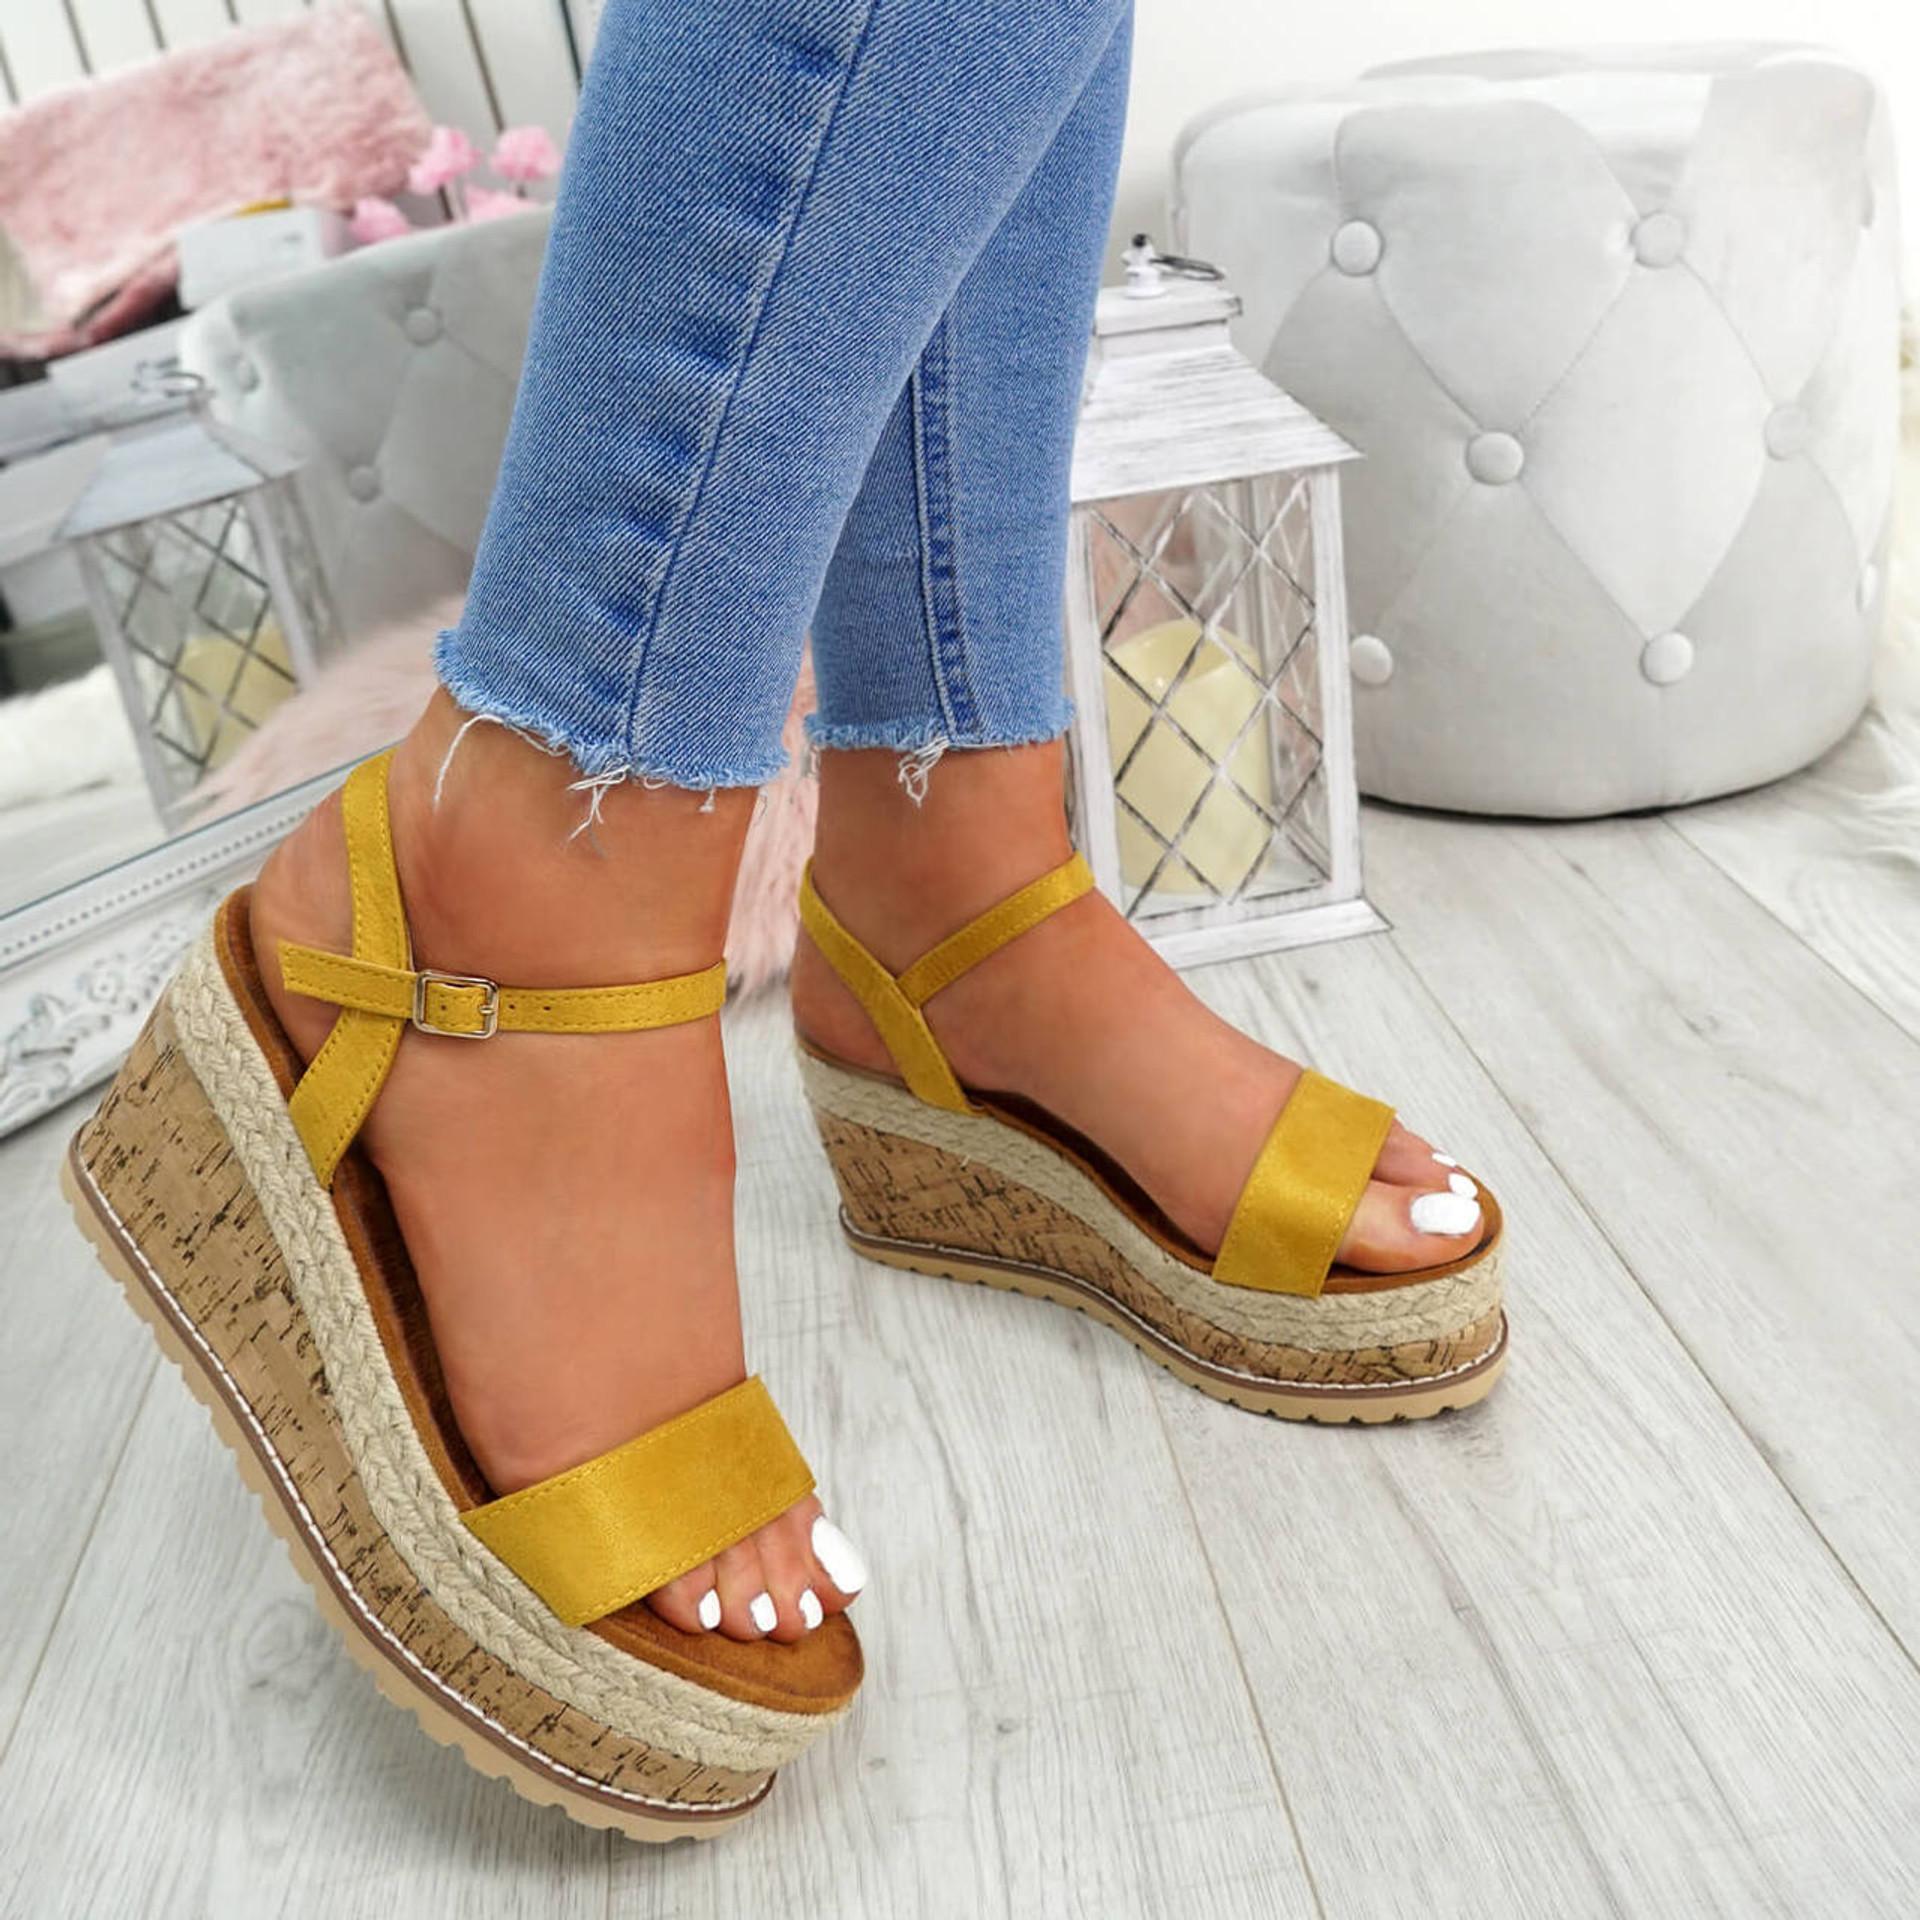 Risse Yellow Platform Sandals